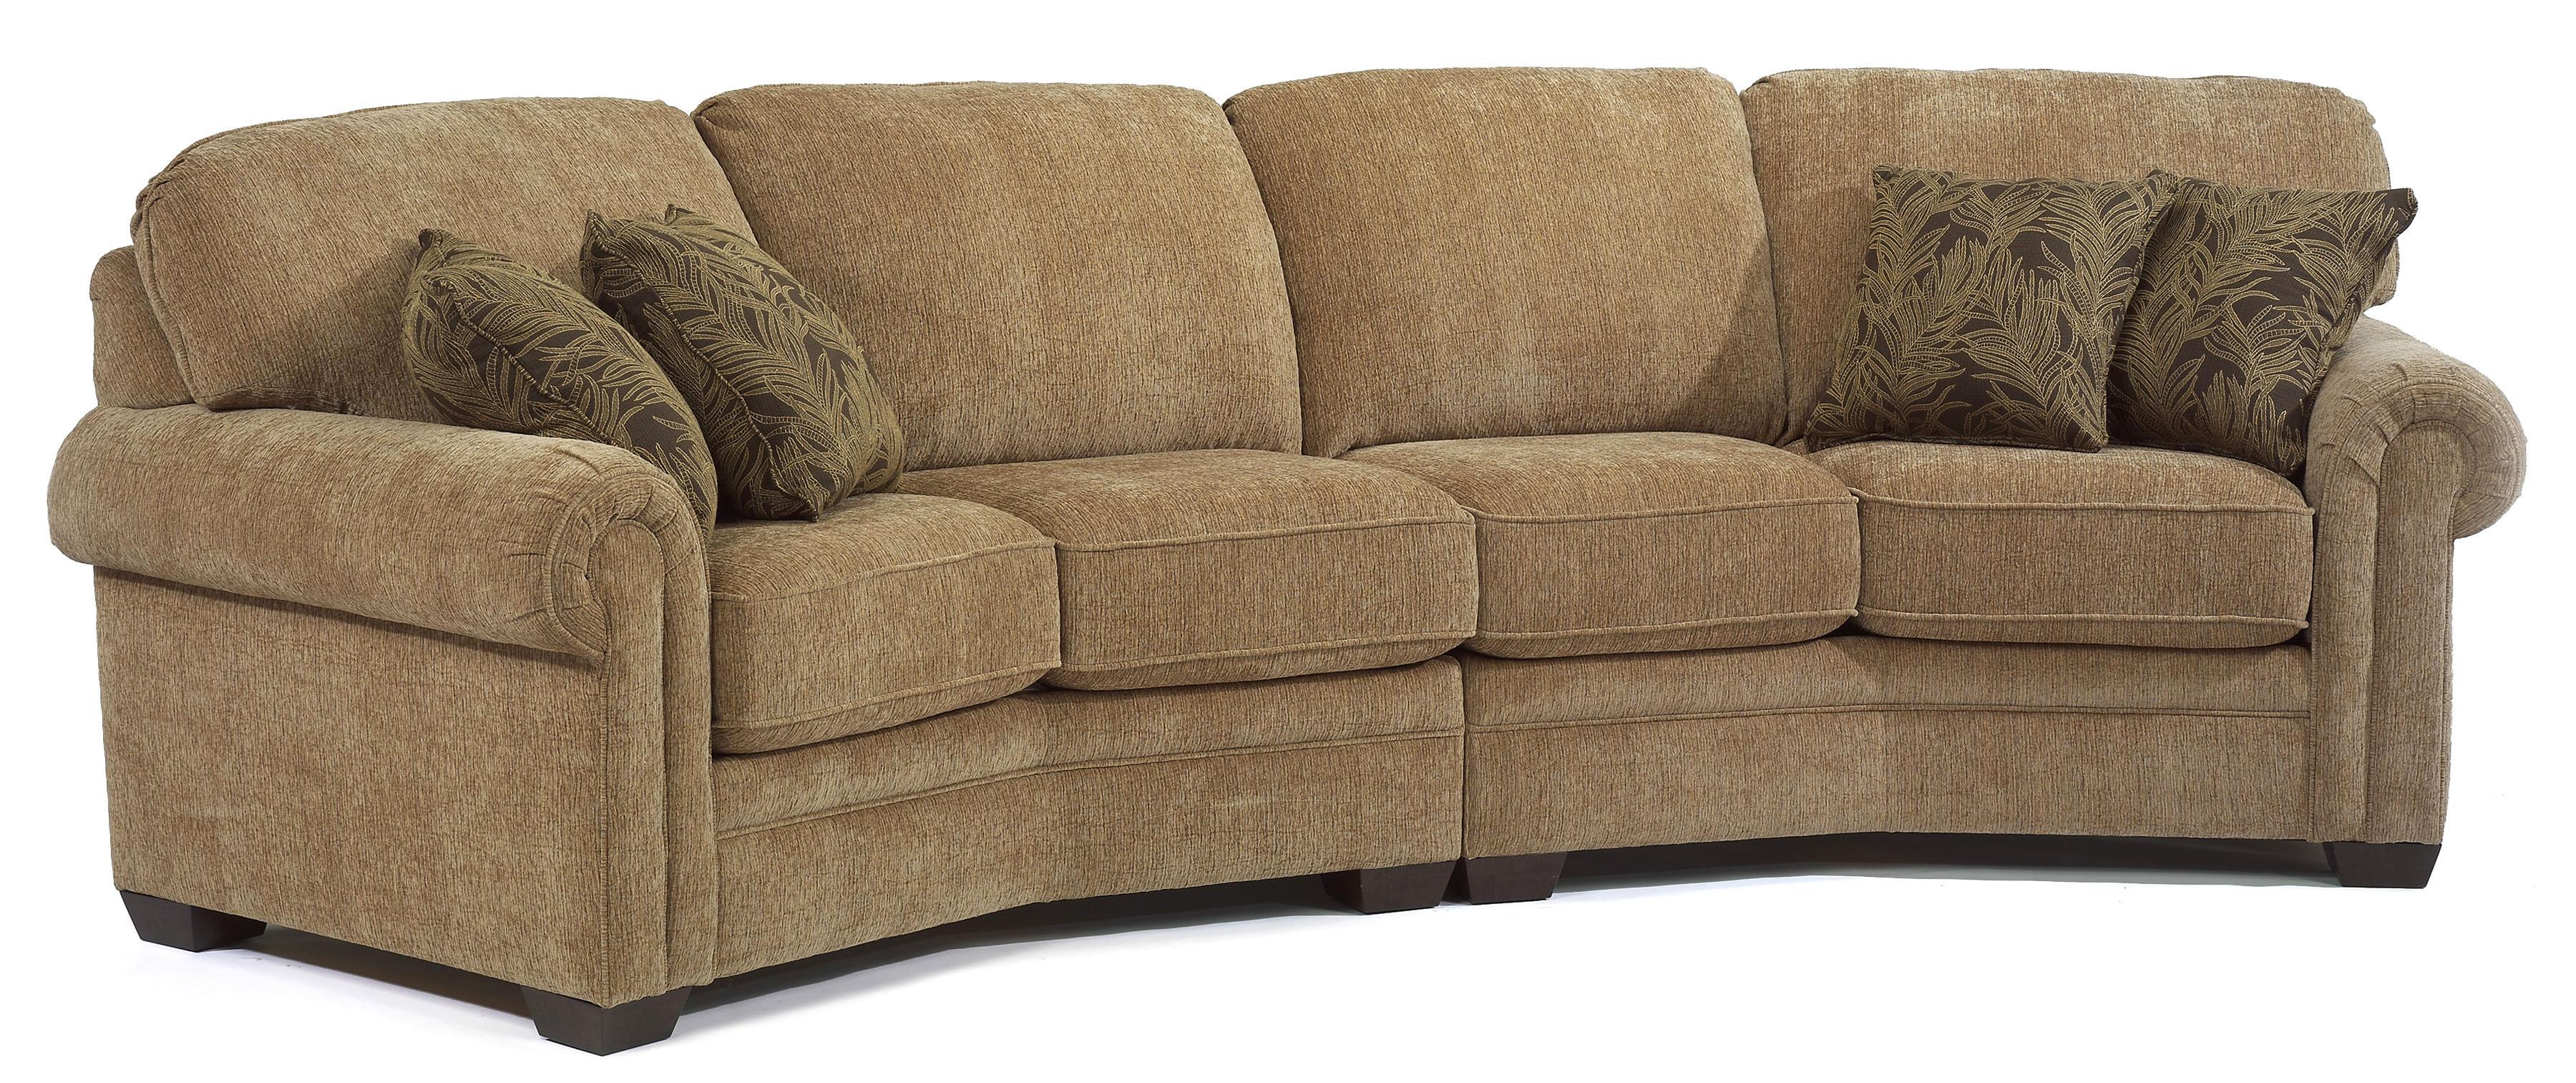 conversation sofas reviews seahorse folding sofa bed singapore nashville franklin